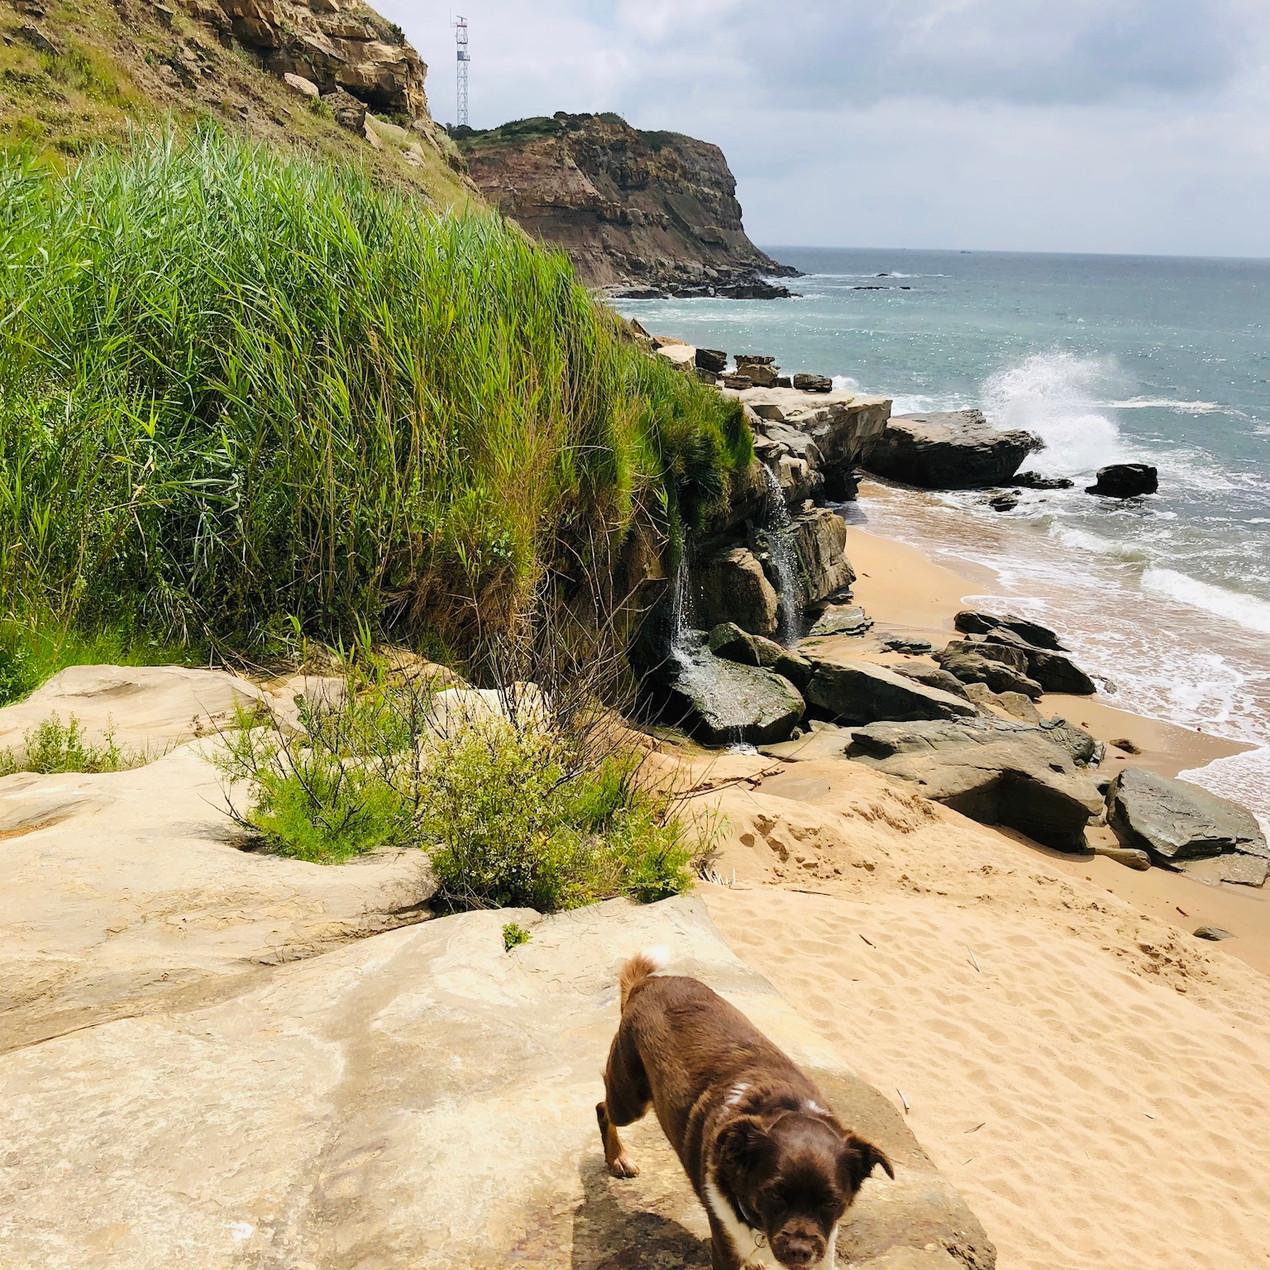 Strand Portugal, Reisen mit Hund